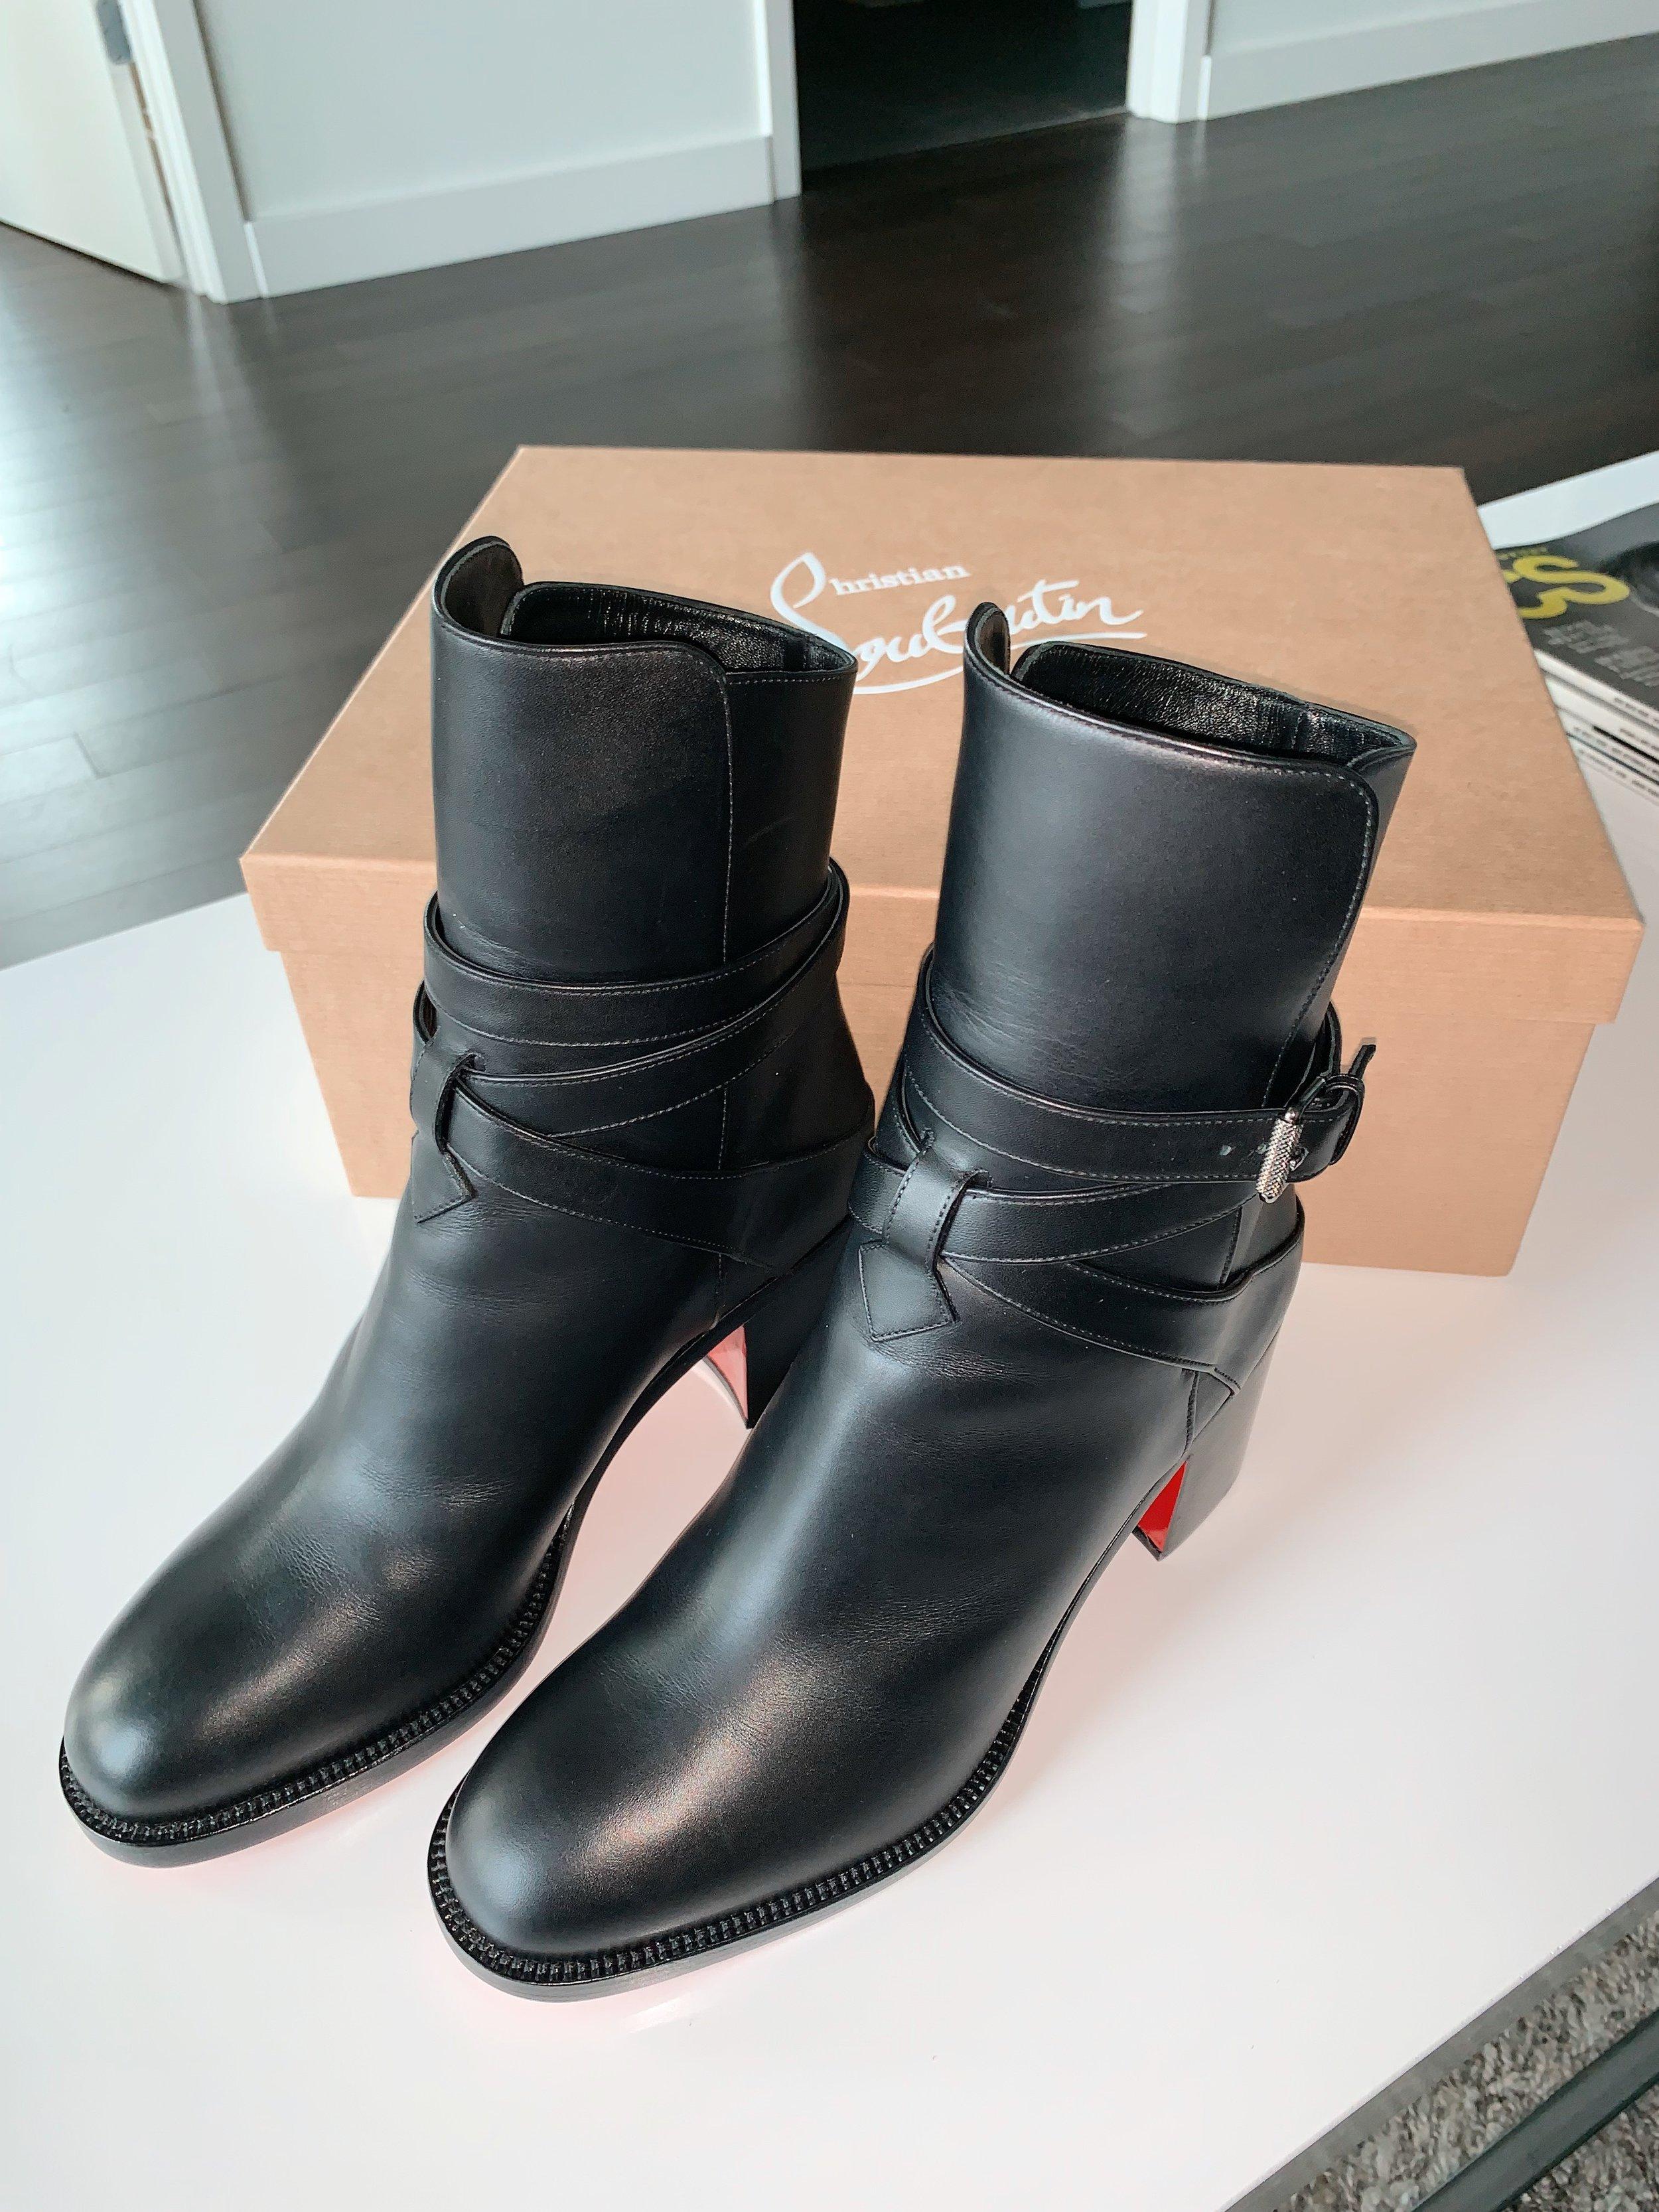 8. Christian Louboutin 'Karistrap' Ankle Bootie {$1,095} -